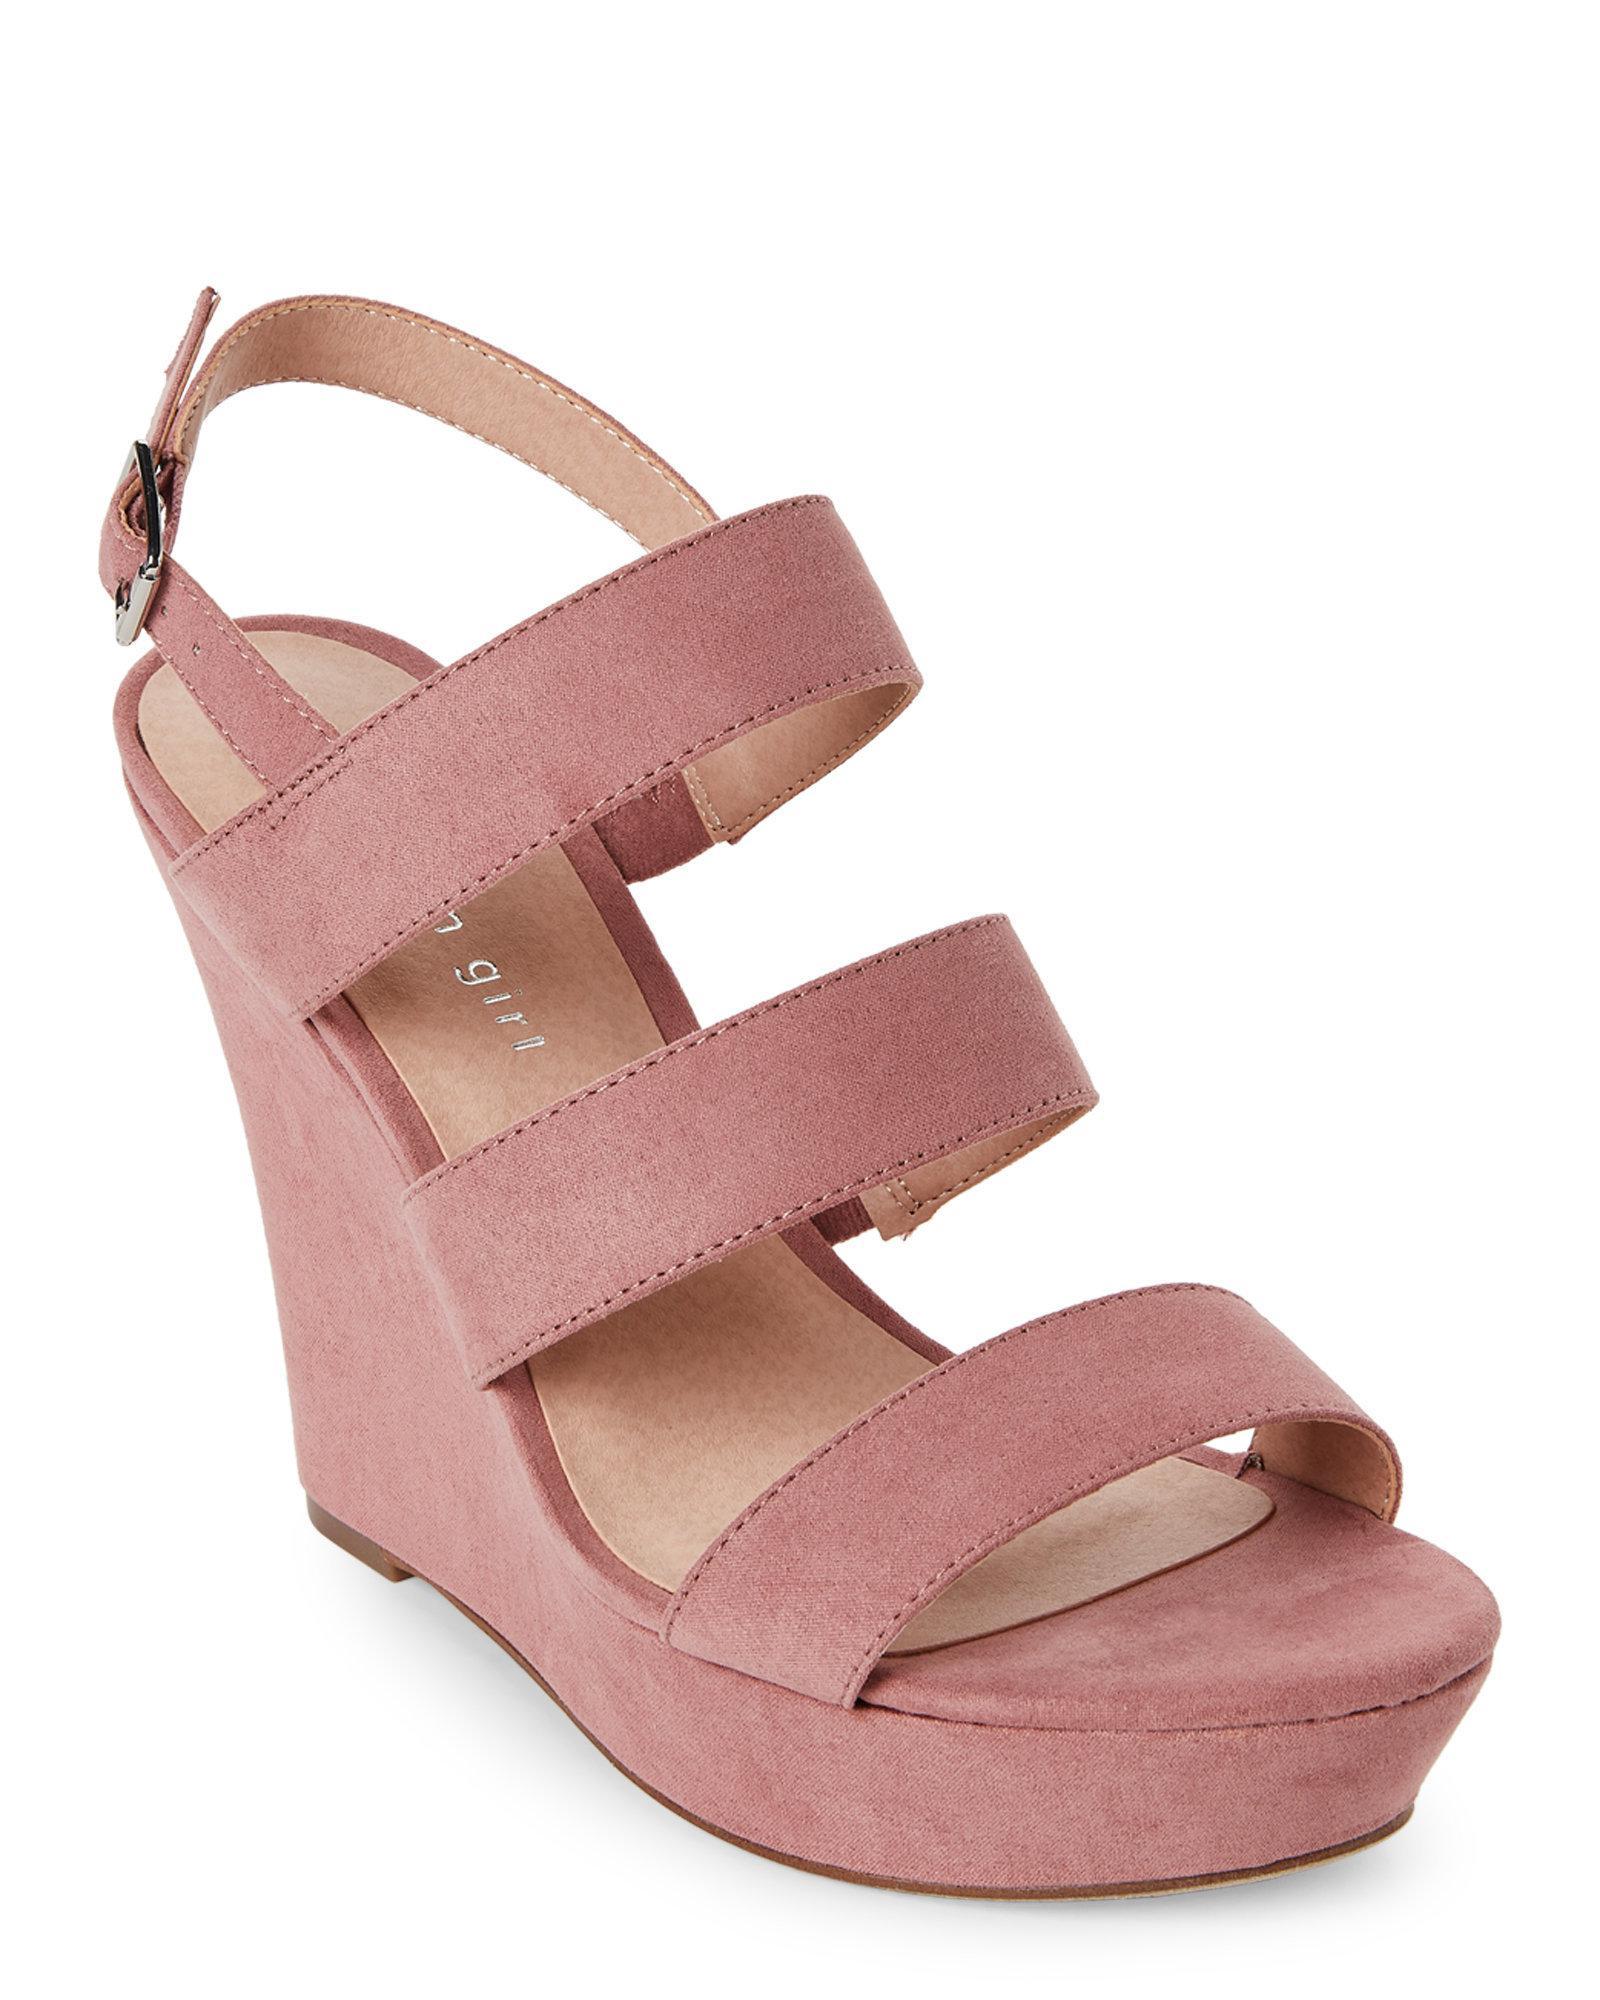 Madden Girl Shelbie Platform Wedge Sandal 4WNtc